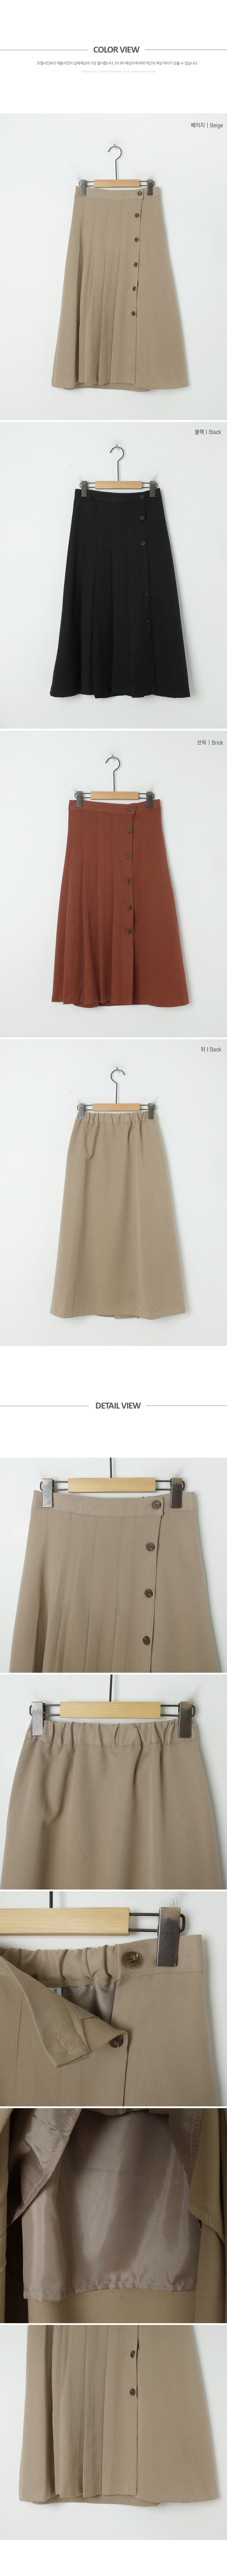 Daily good day skirt